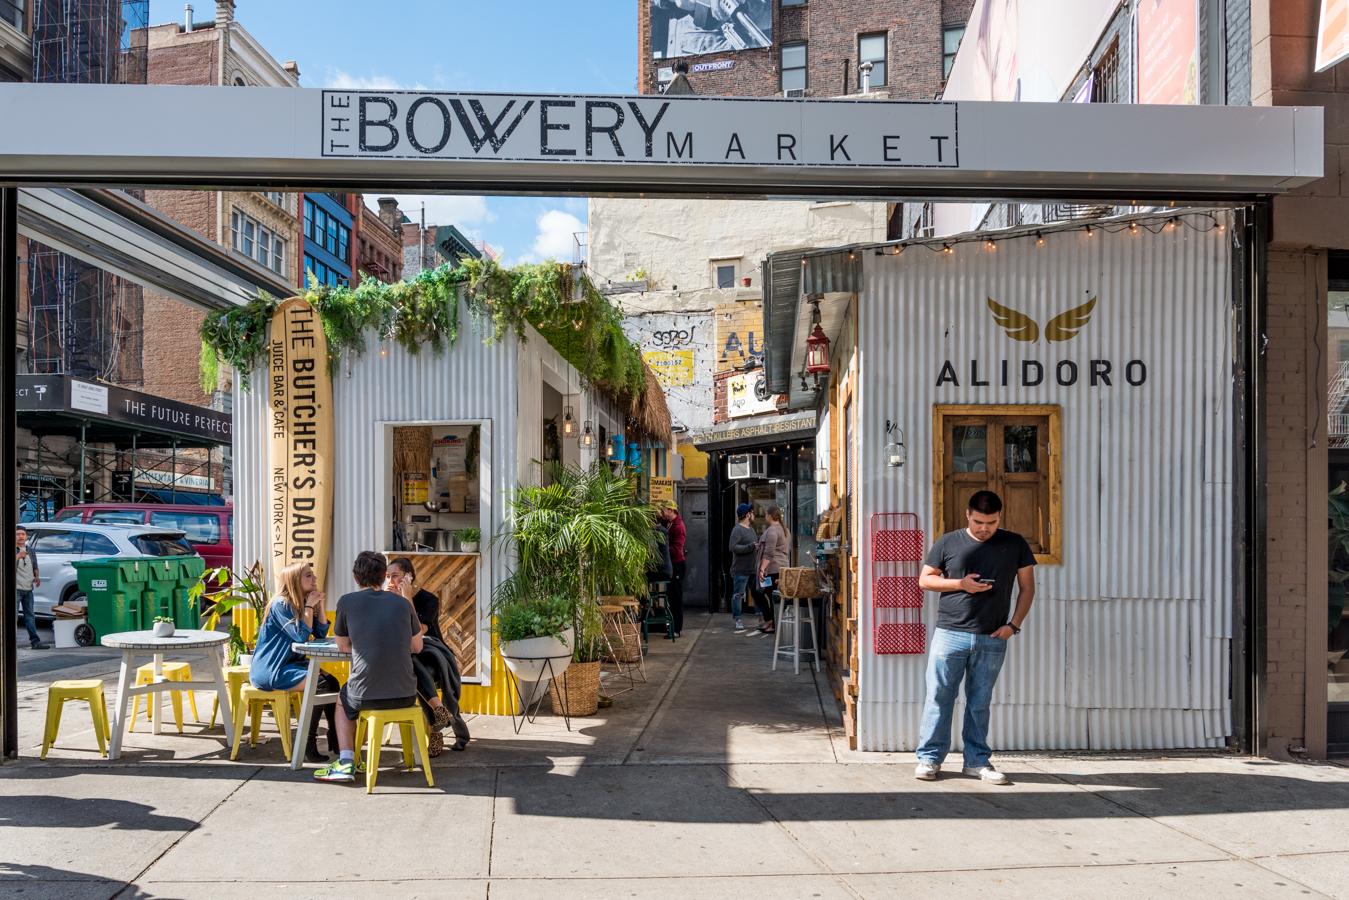 Rock mama nyc lifestyle blog-The Bowery Market